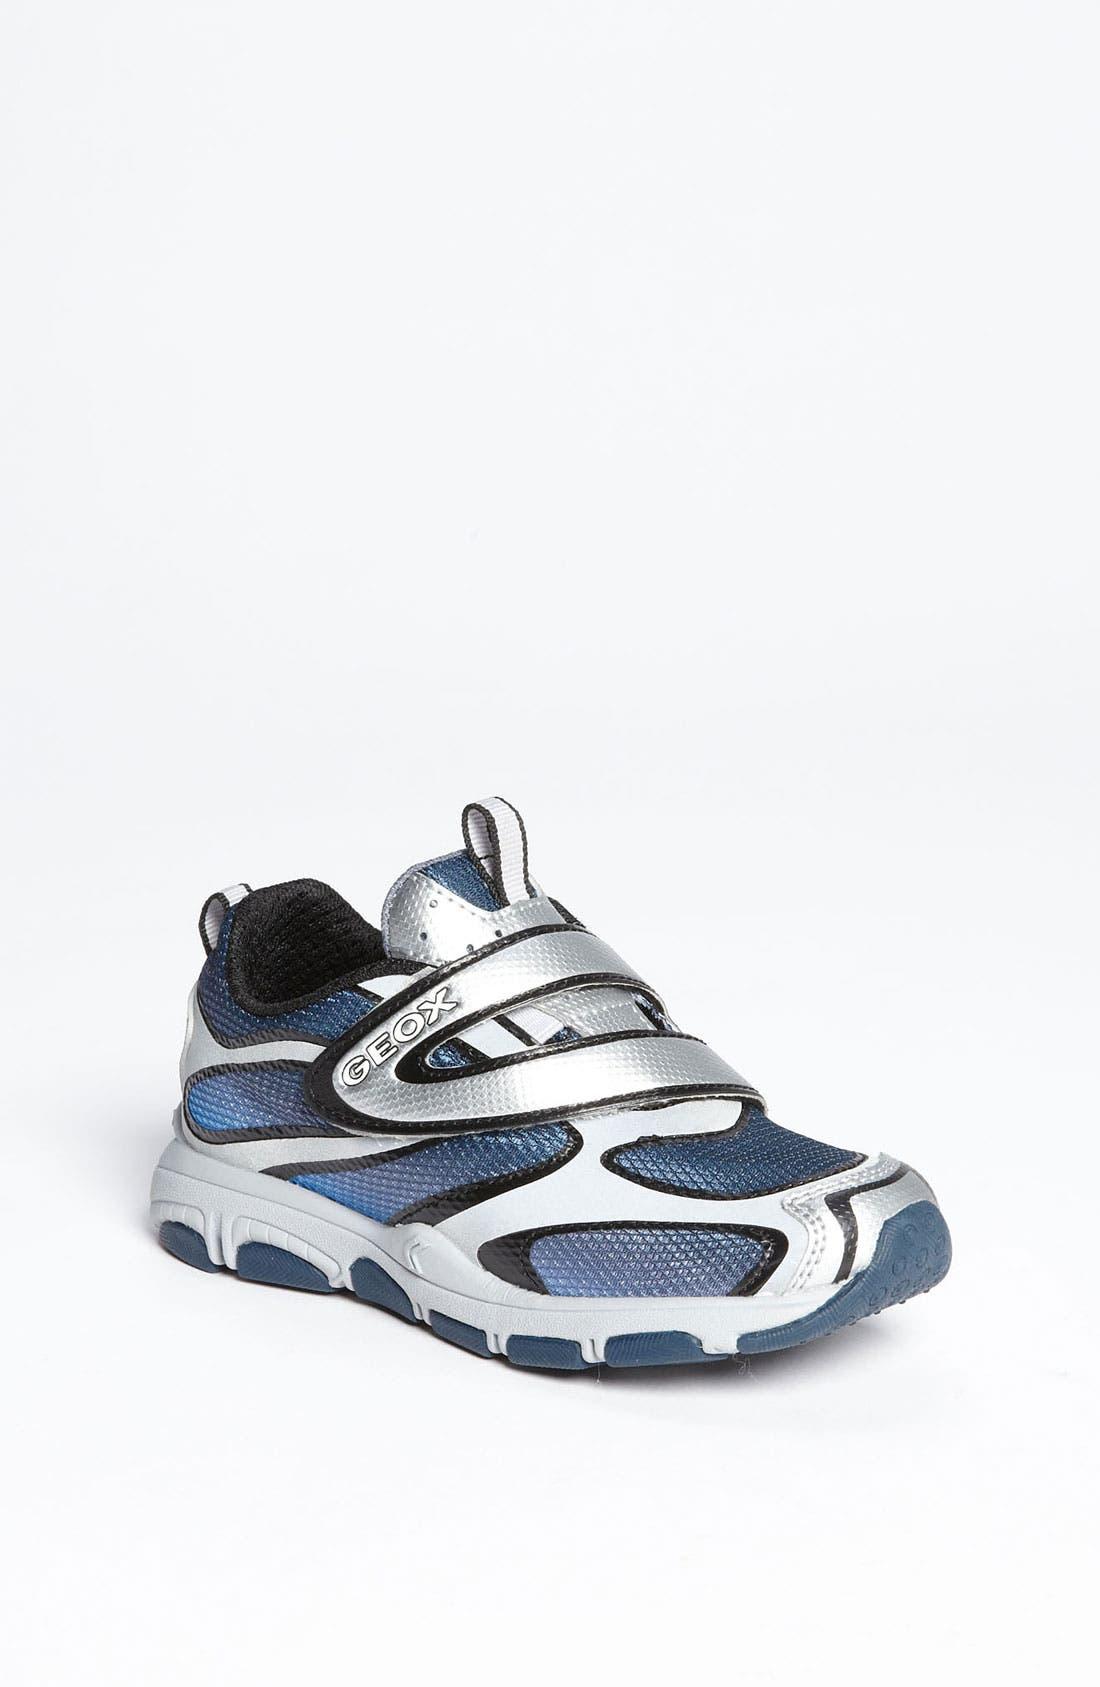 Main Image - Geox 'J Torque' Sneaker (Toddler & Little Kid)